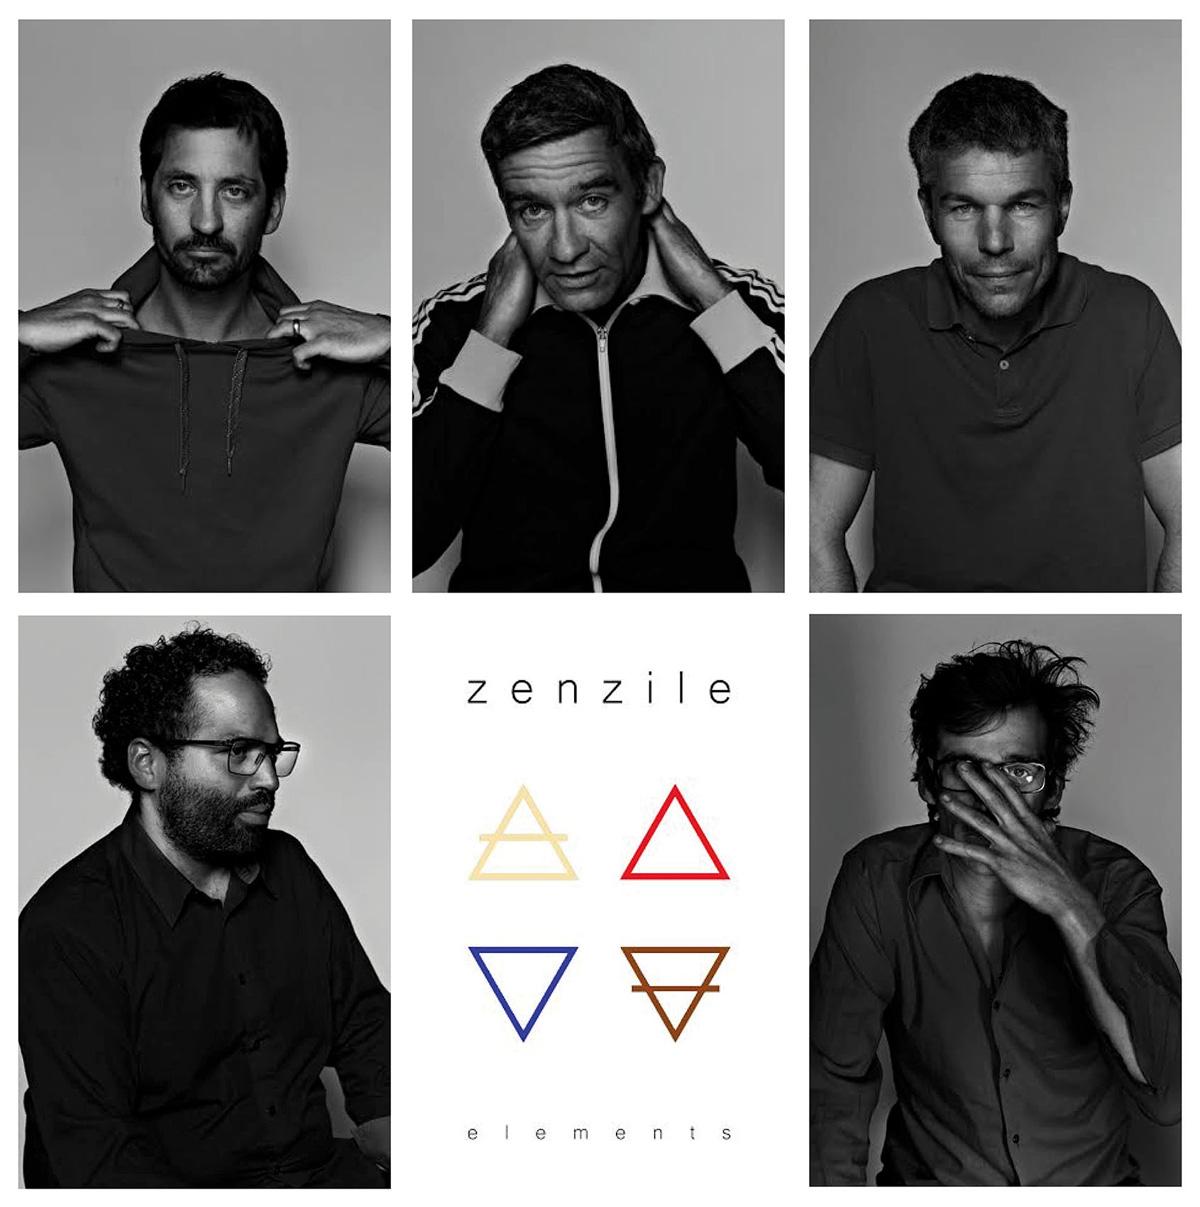 zenzile-elements-press